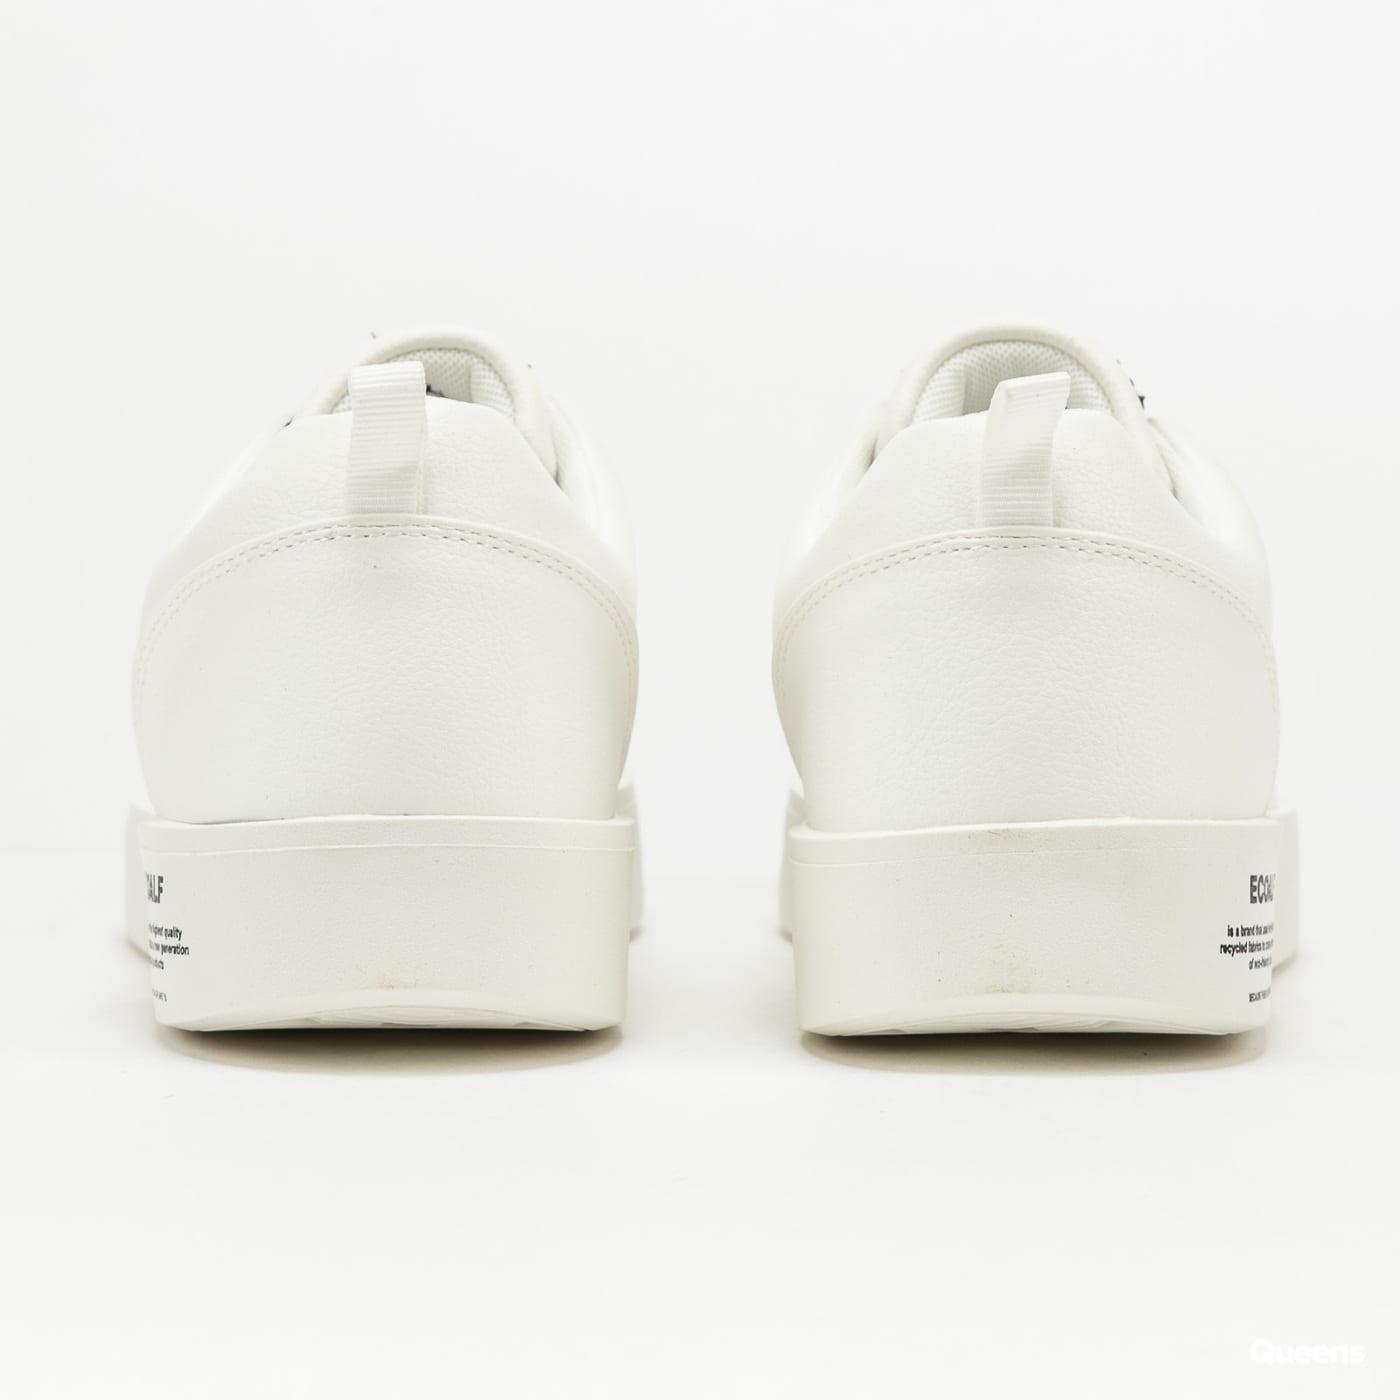 Ecoalf Elioalf Grape Sneakers off white